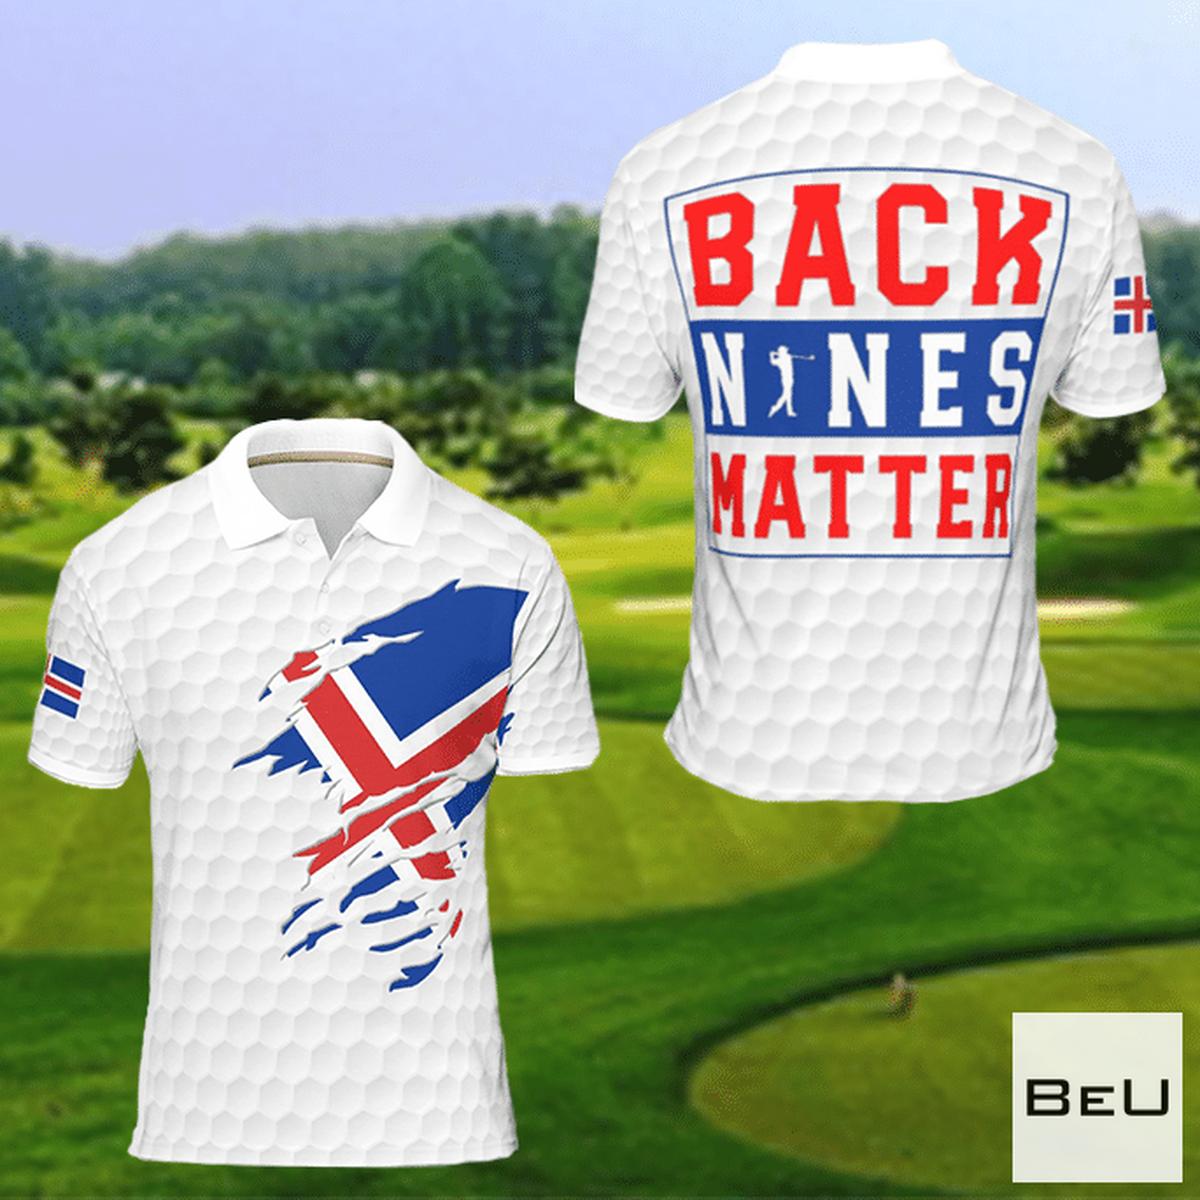 Iceland Back Nines Matter Golf Polo Shirt